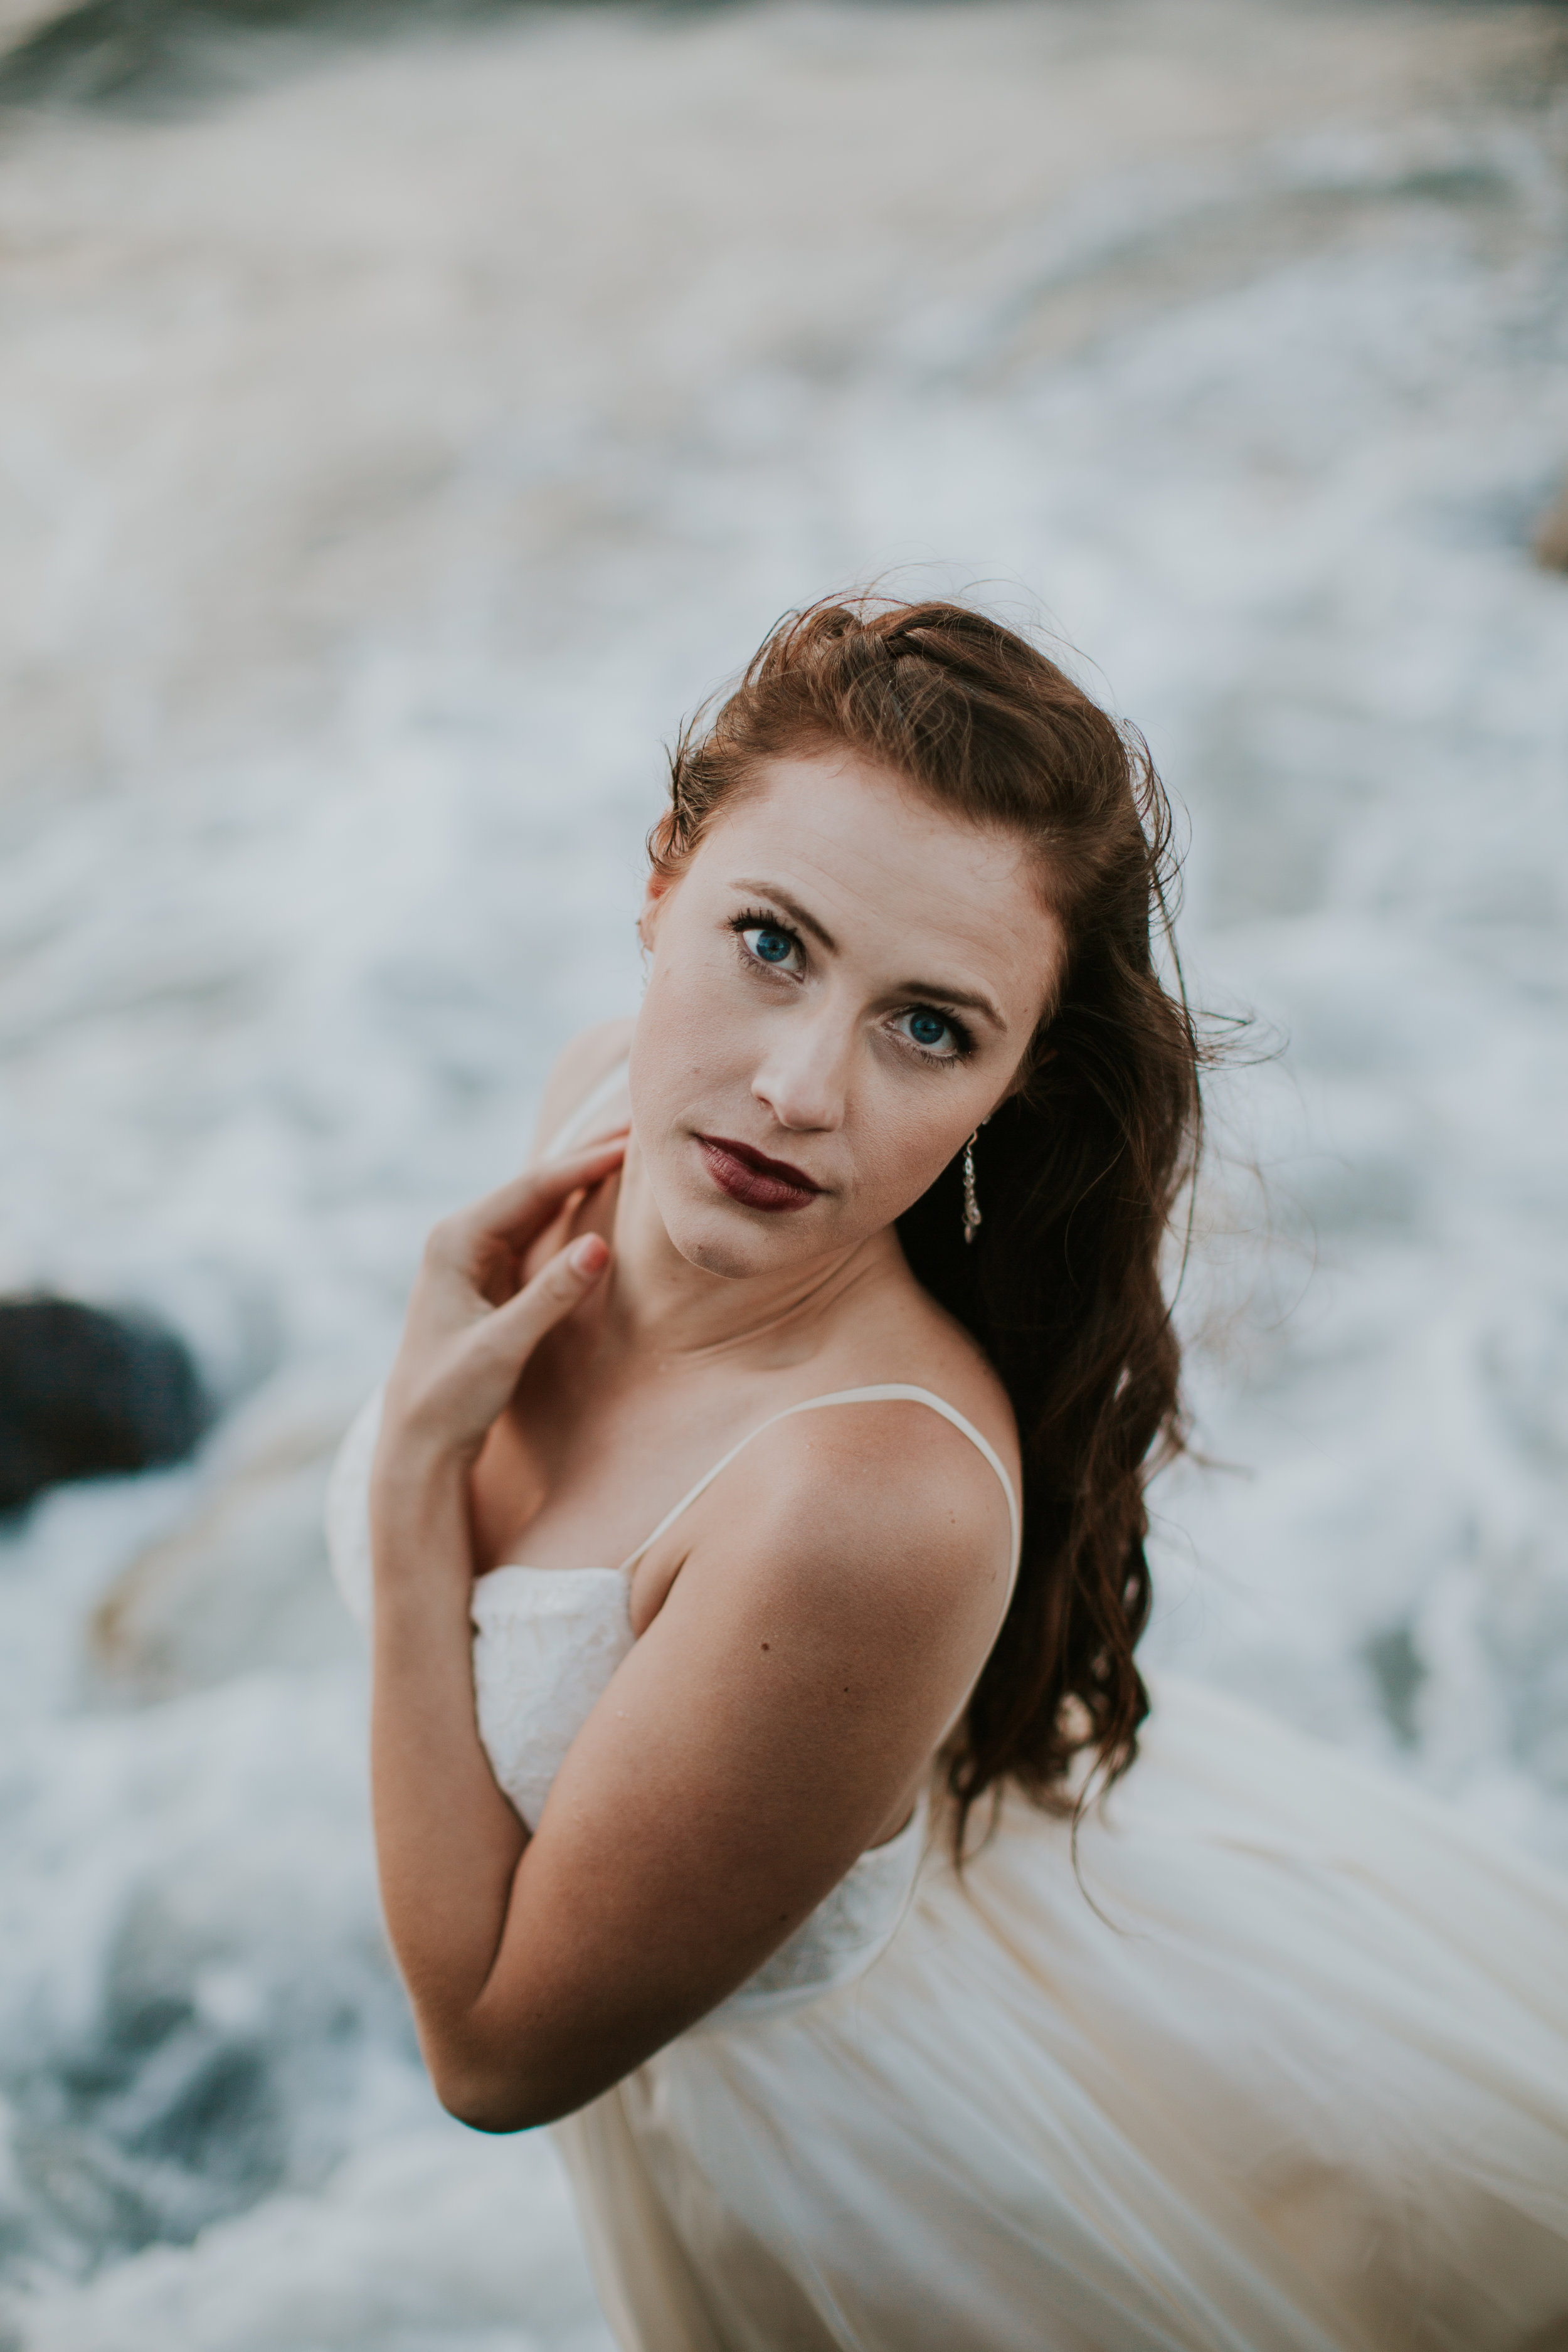 Port-Angeles-Photographer-Olympic-Peninsula-Wedding-Ediz-Hook-bride-dress-Kayla-Dawn-Photography-Olympic-Peninsula-PNW-Photographer-Portrait-Portraiture-Natural-Golden-Hour-Beach (15).jpg